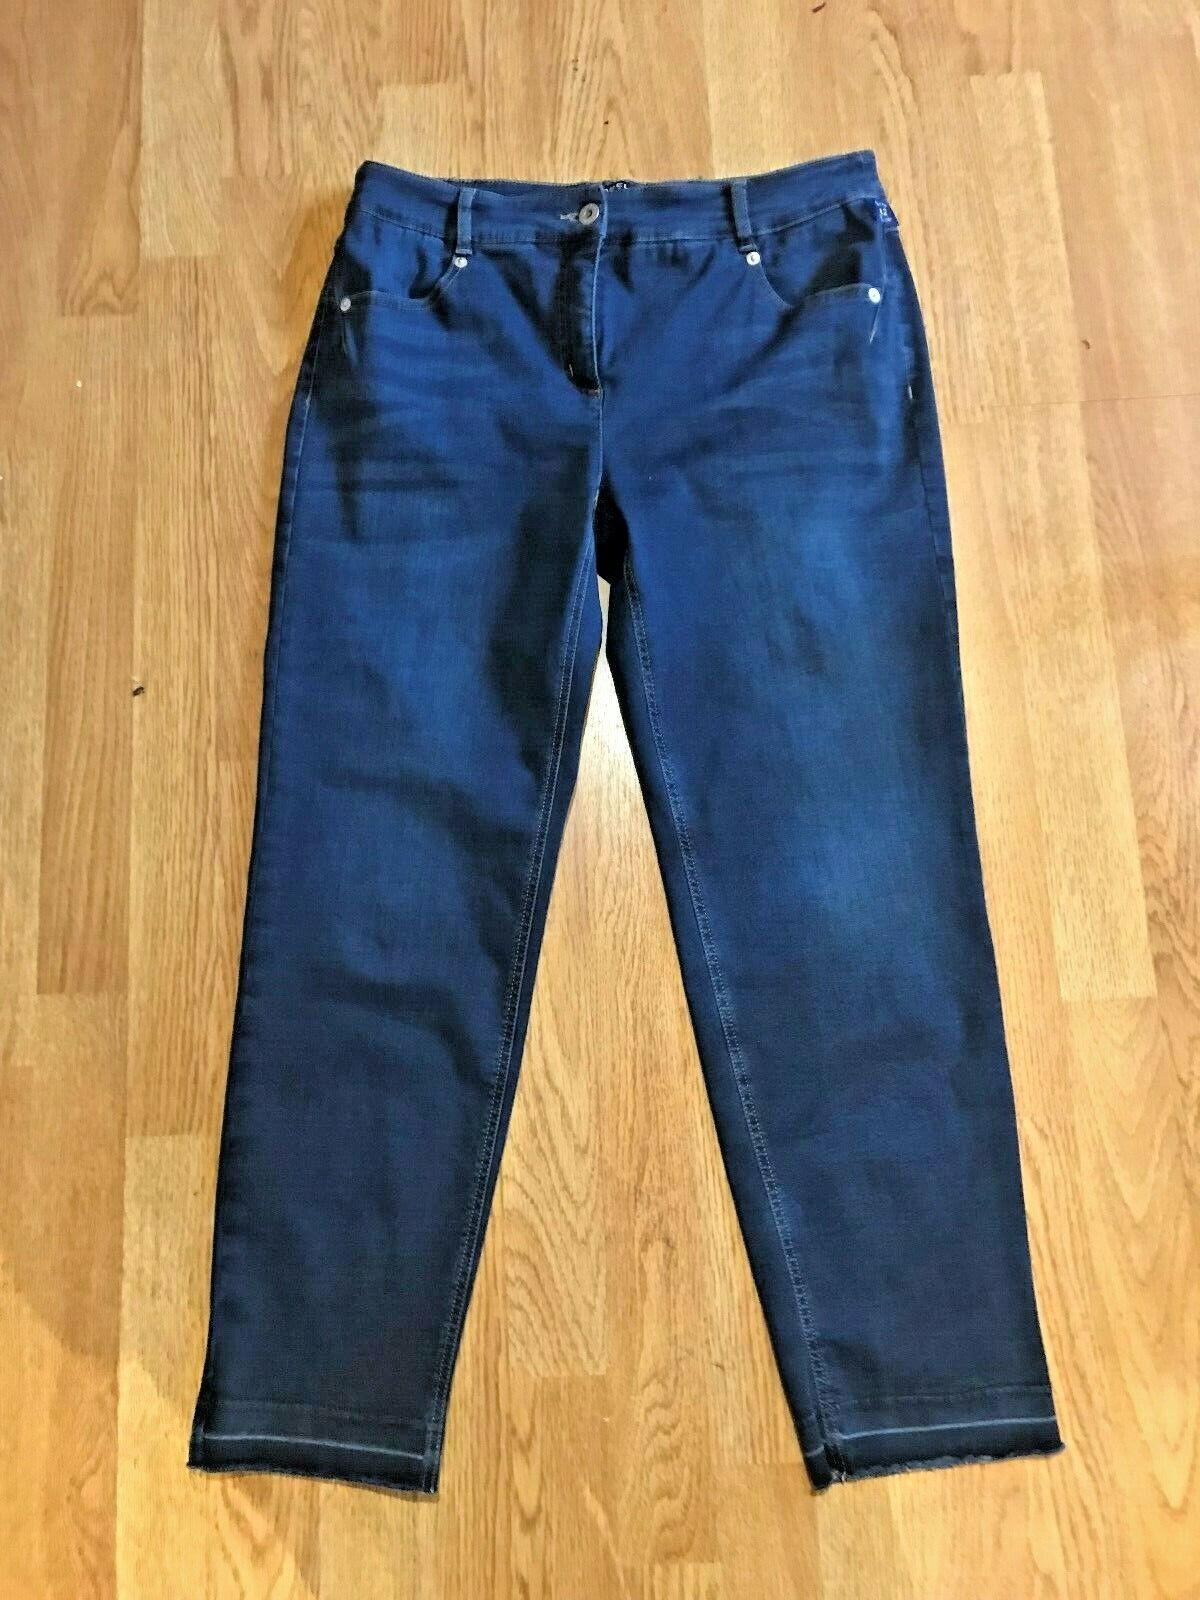 Robell Elena 09 Stretch Dark bluee Skinny Cropped Mid Rise Raw Hem Jeans BNWT s16